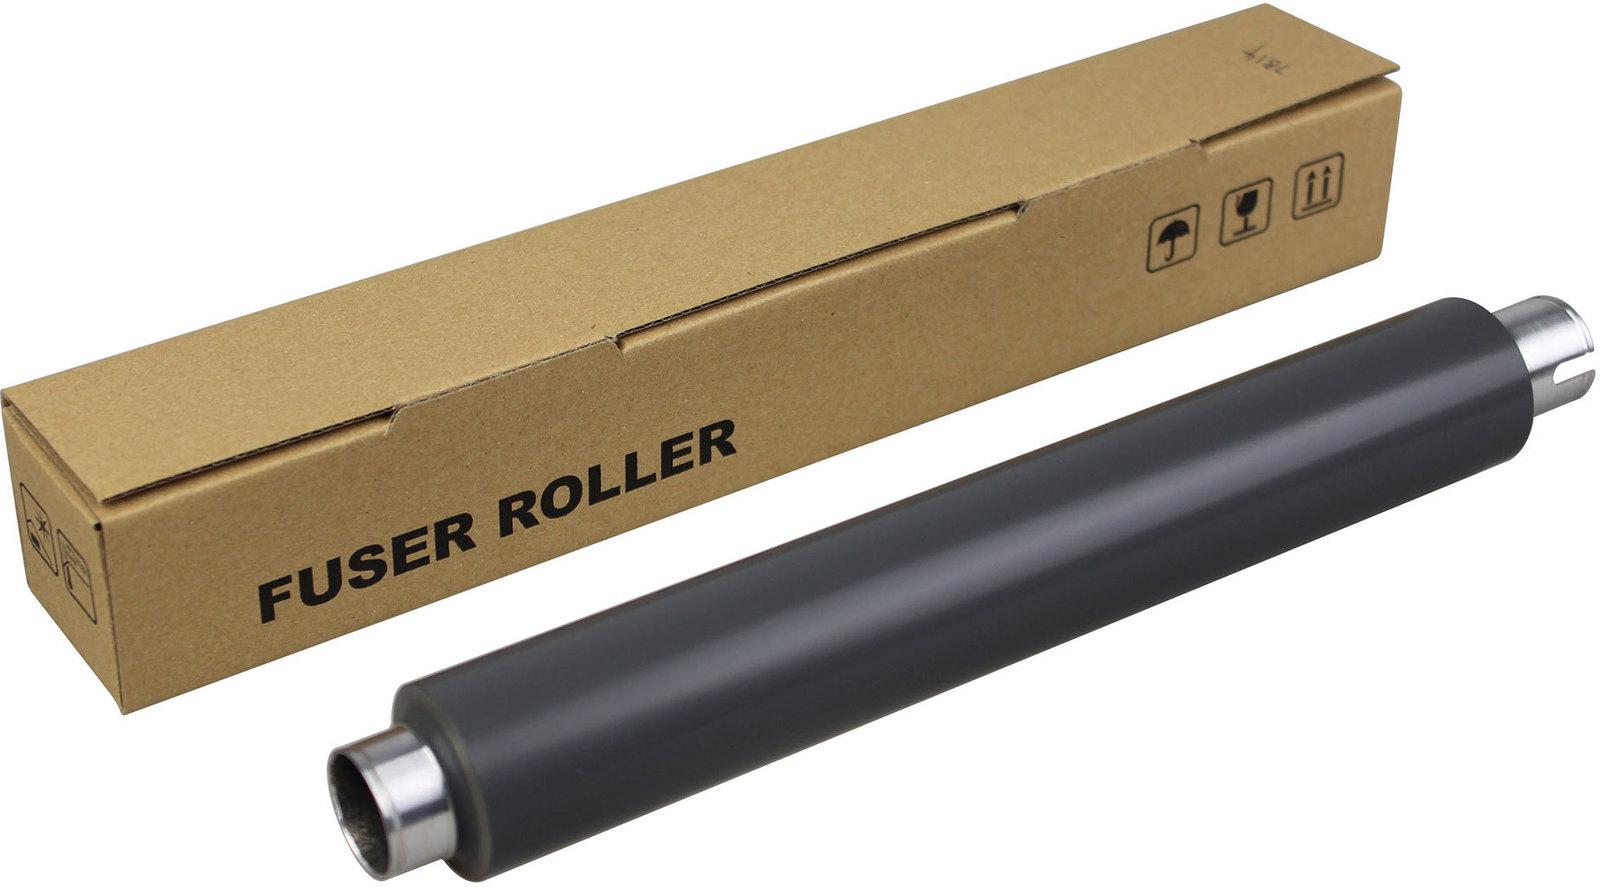 CoreParts MSP7814 printer roller